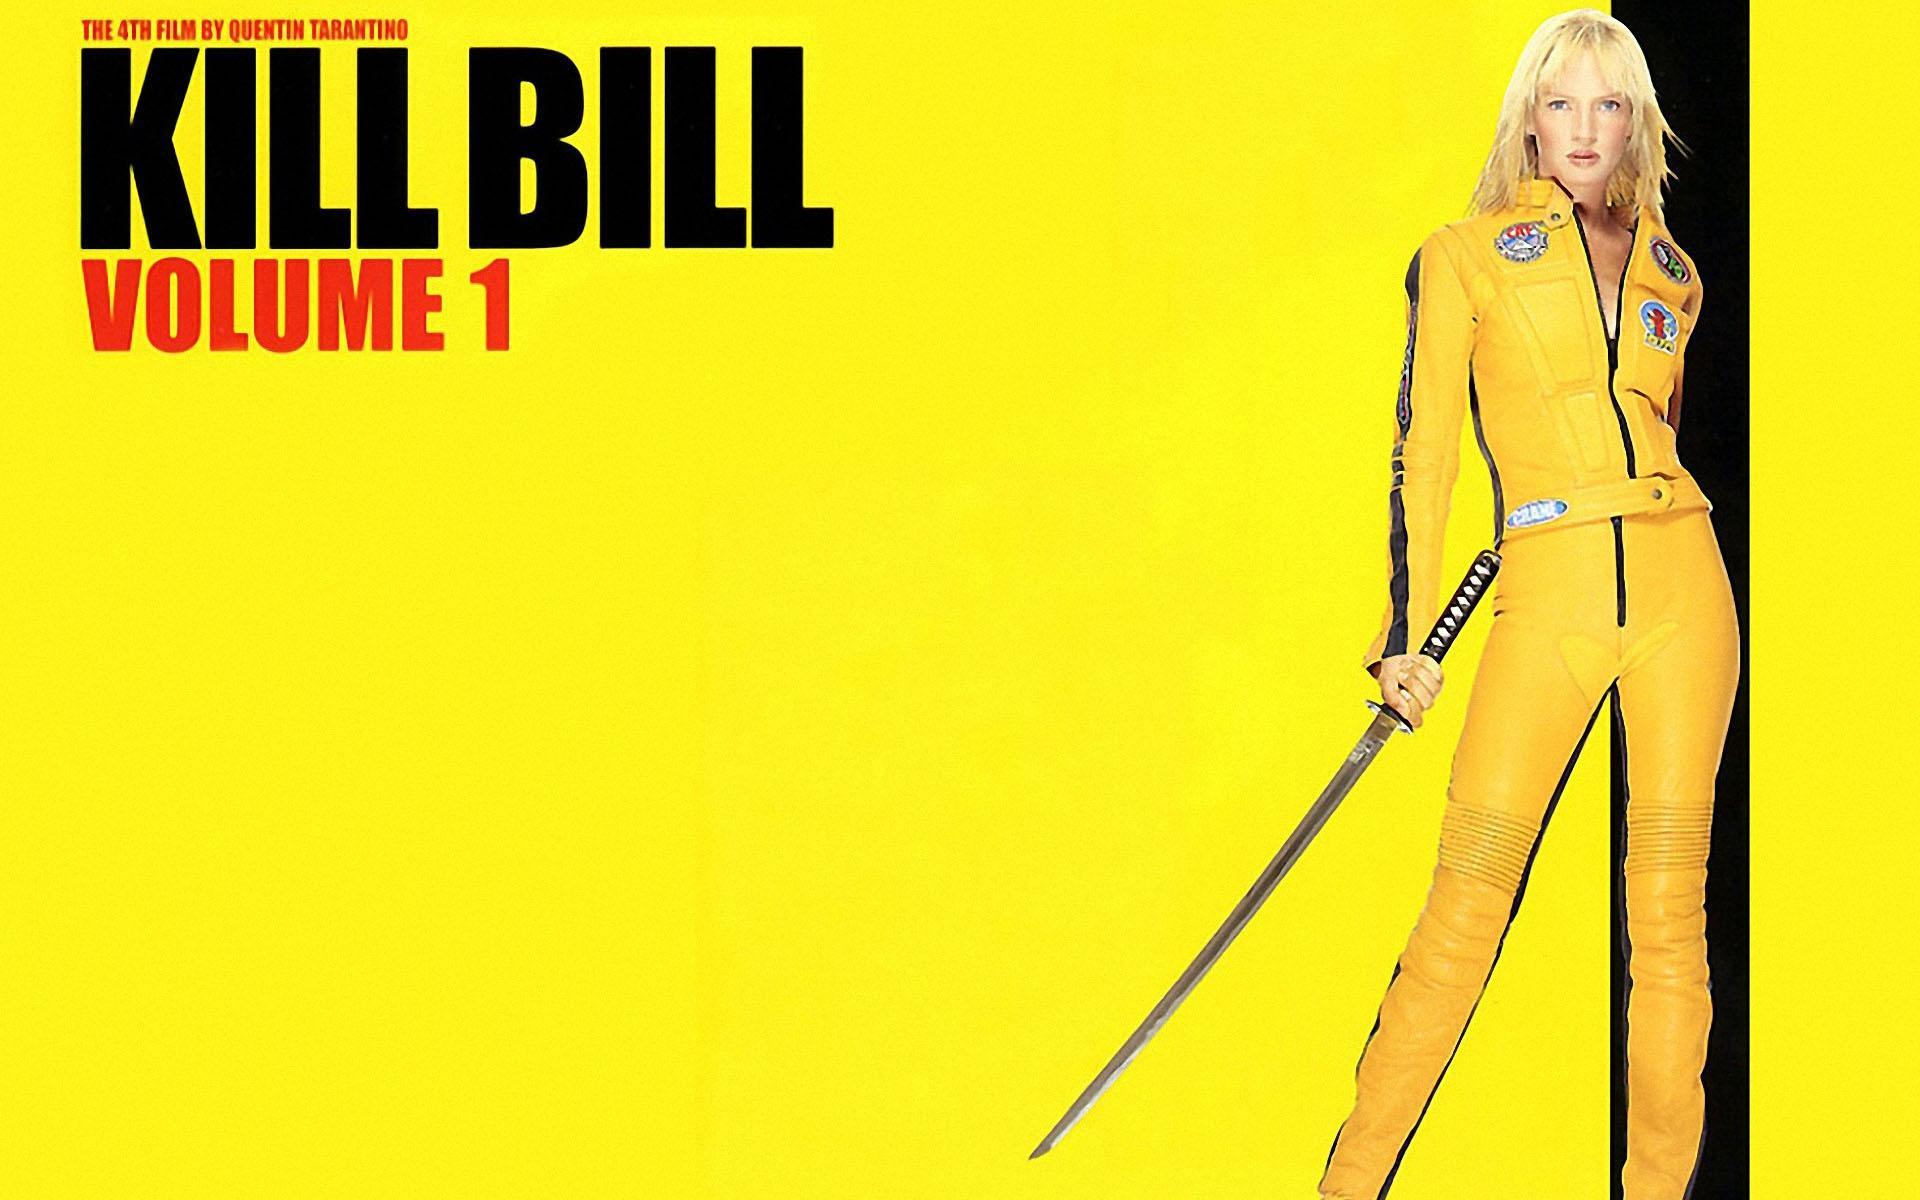 Kill Bill wallpapers, Anime, HQ Kill Bill pictures | 4K Wallpapers 2019